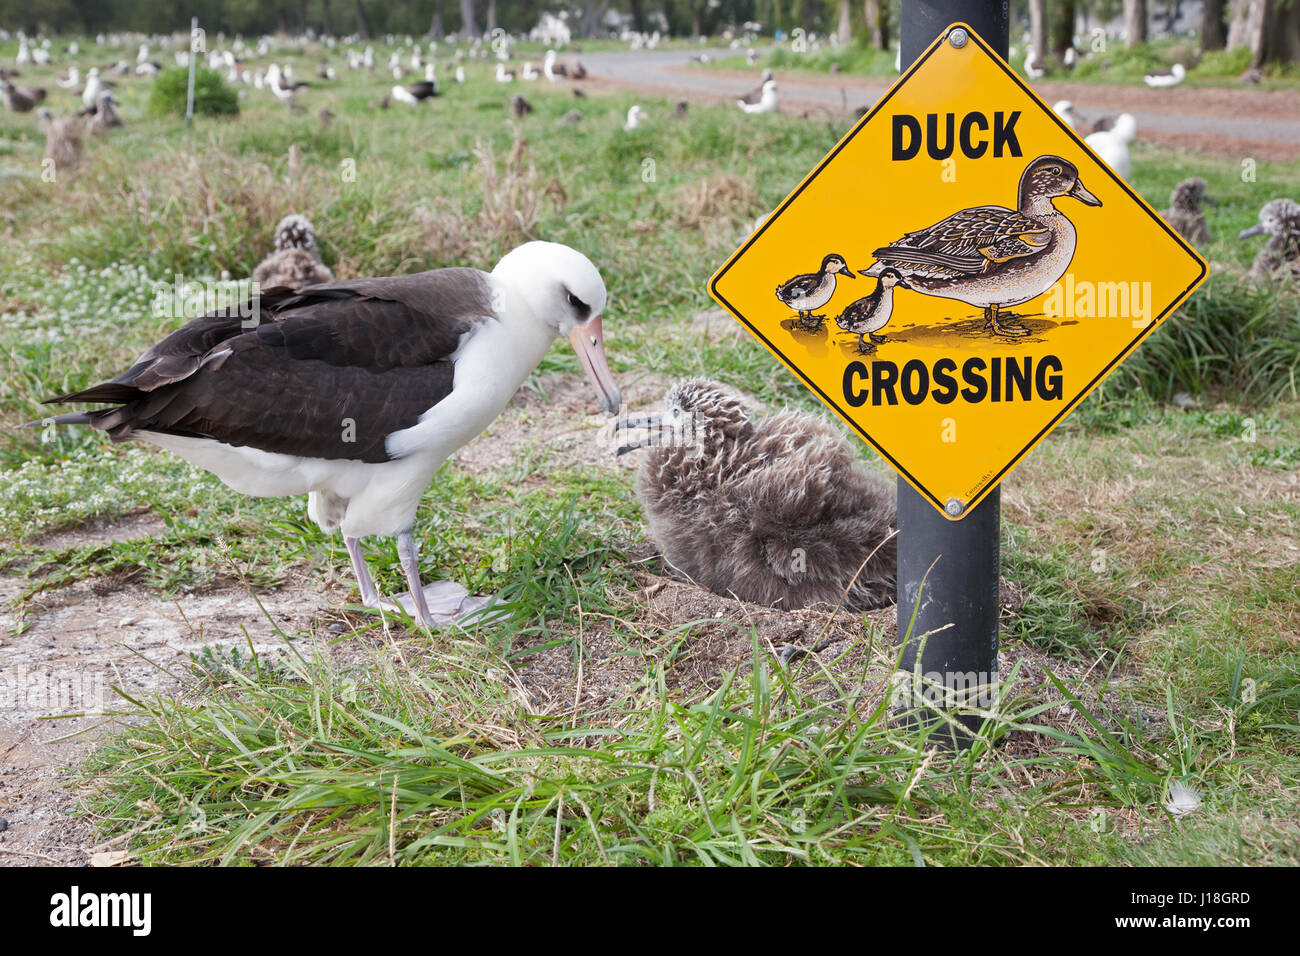 Laysan Albatross (Phoebastria immutabilis) nesting beside Duck Crossing sign. - Stock Image